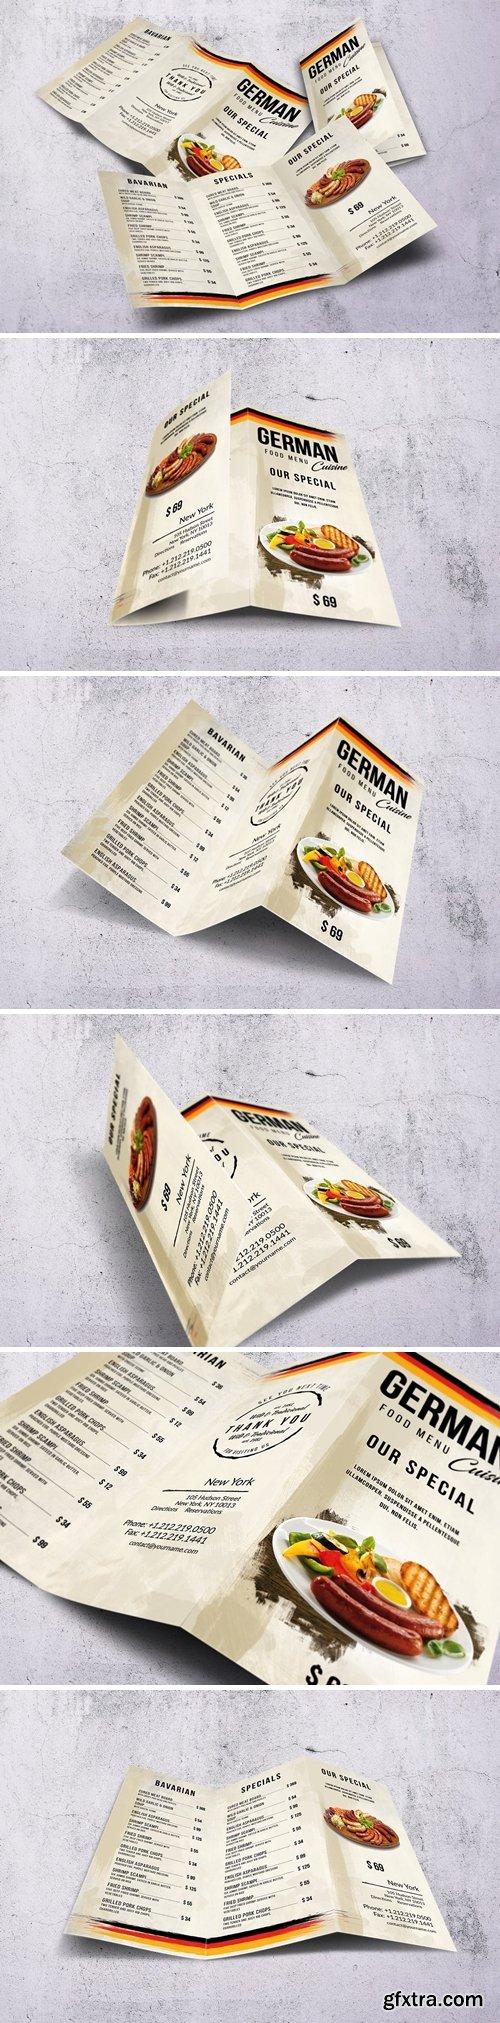 German Cuisine A4 & US Letter Trifold Food Menu